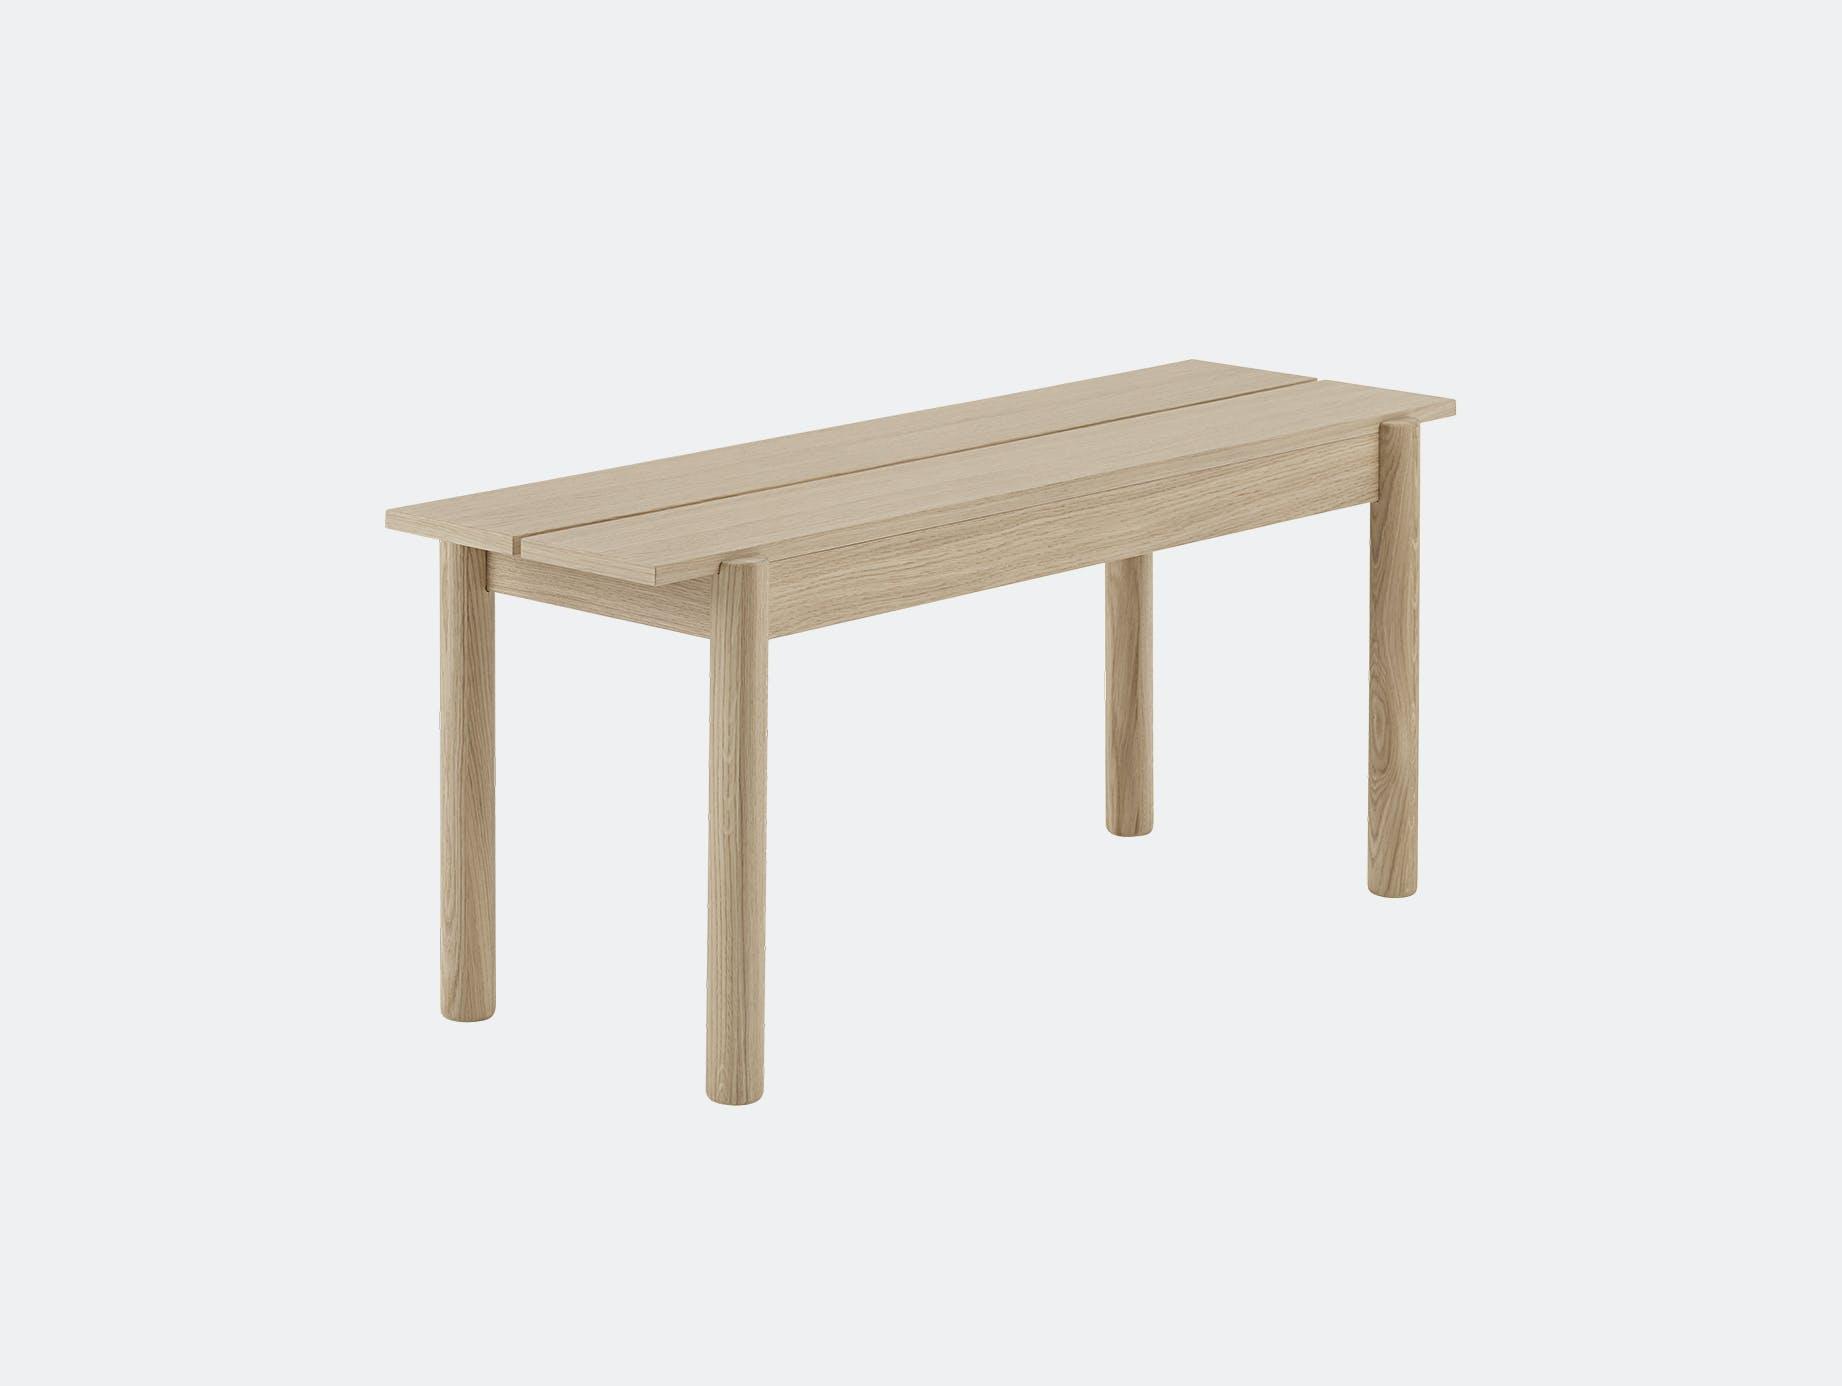 Muuto linear wood bench 110 cm